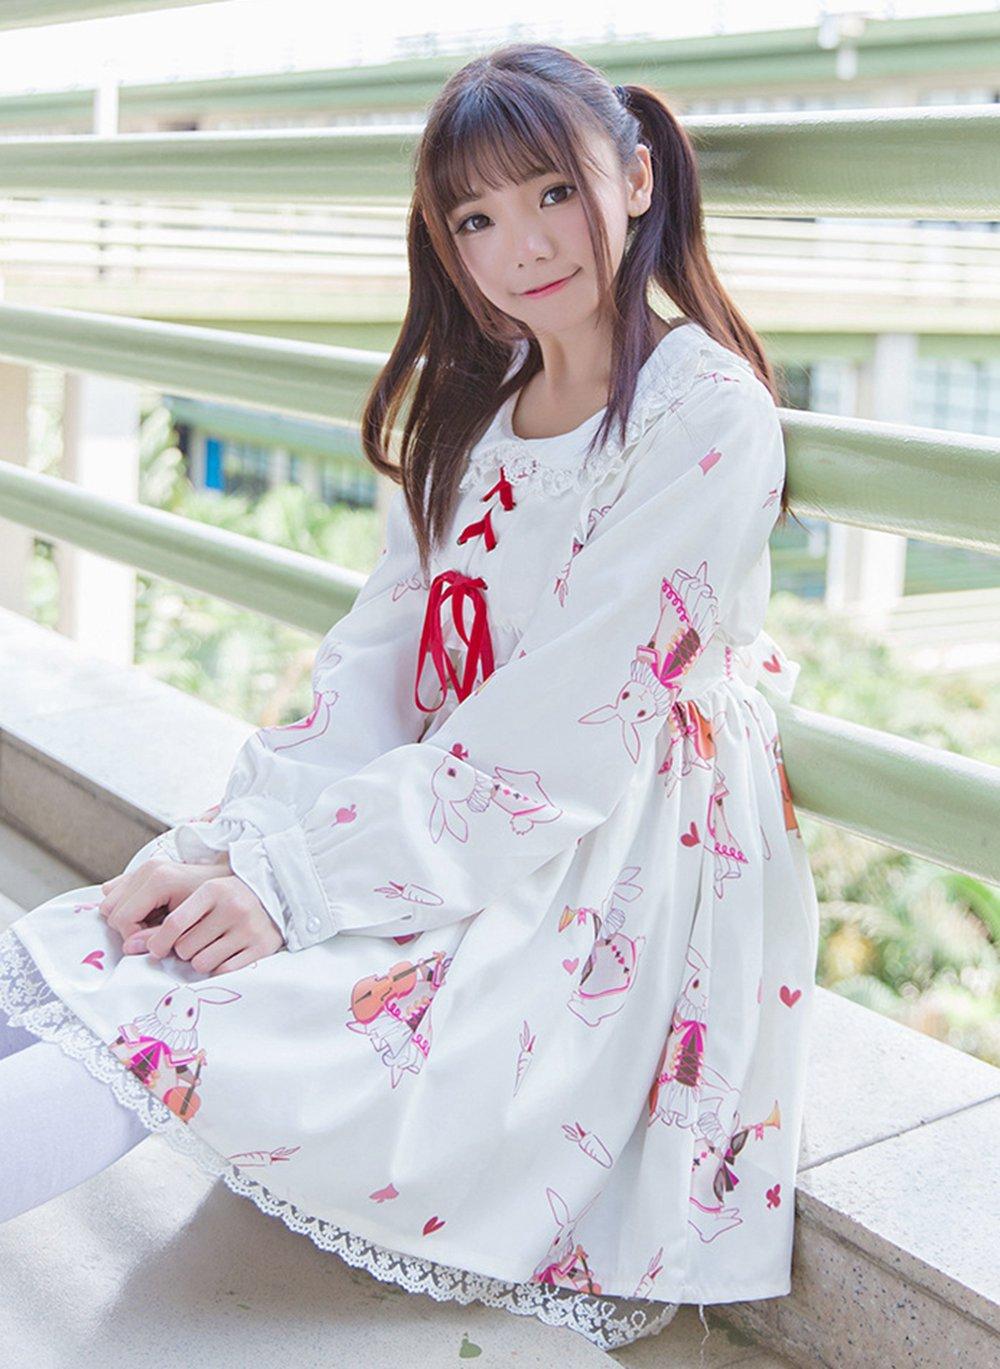 Kawaii robe femmes mignon princesse blanc rouge lapin imprimé col claudine manches longues Lolita robes